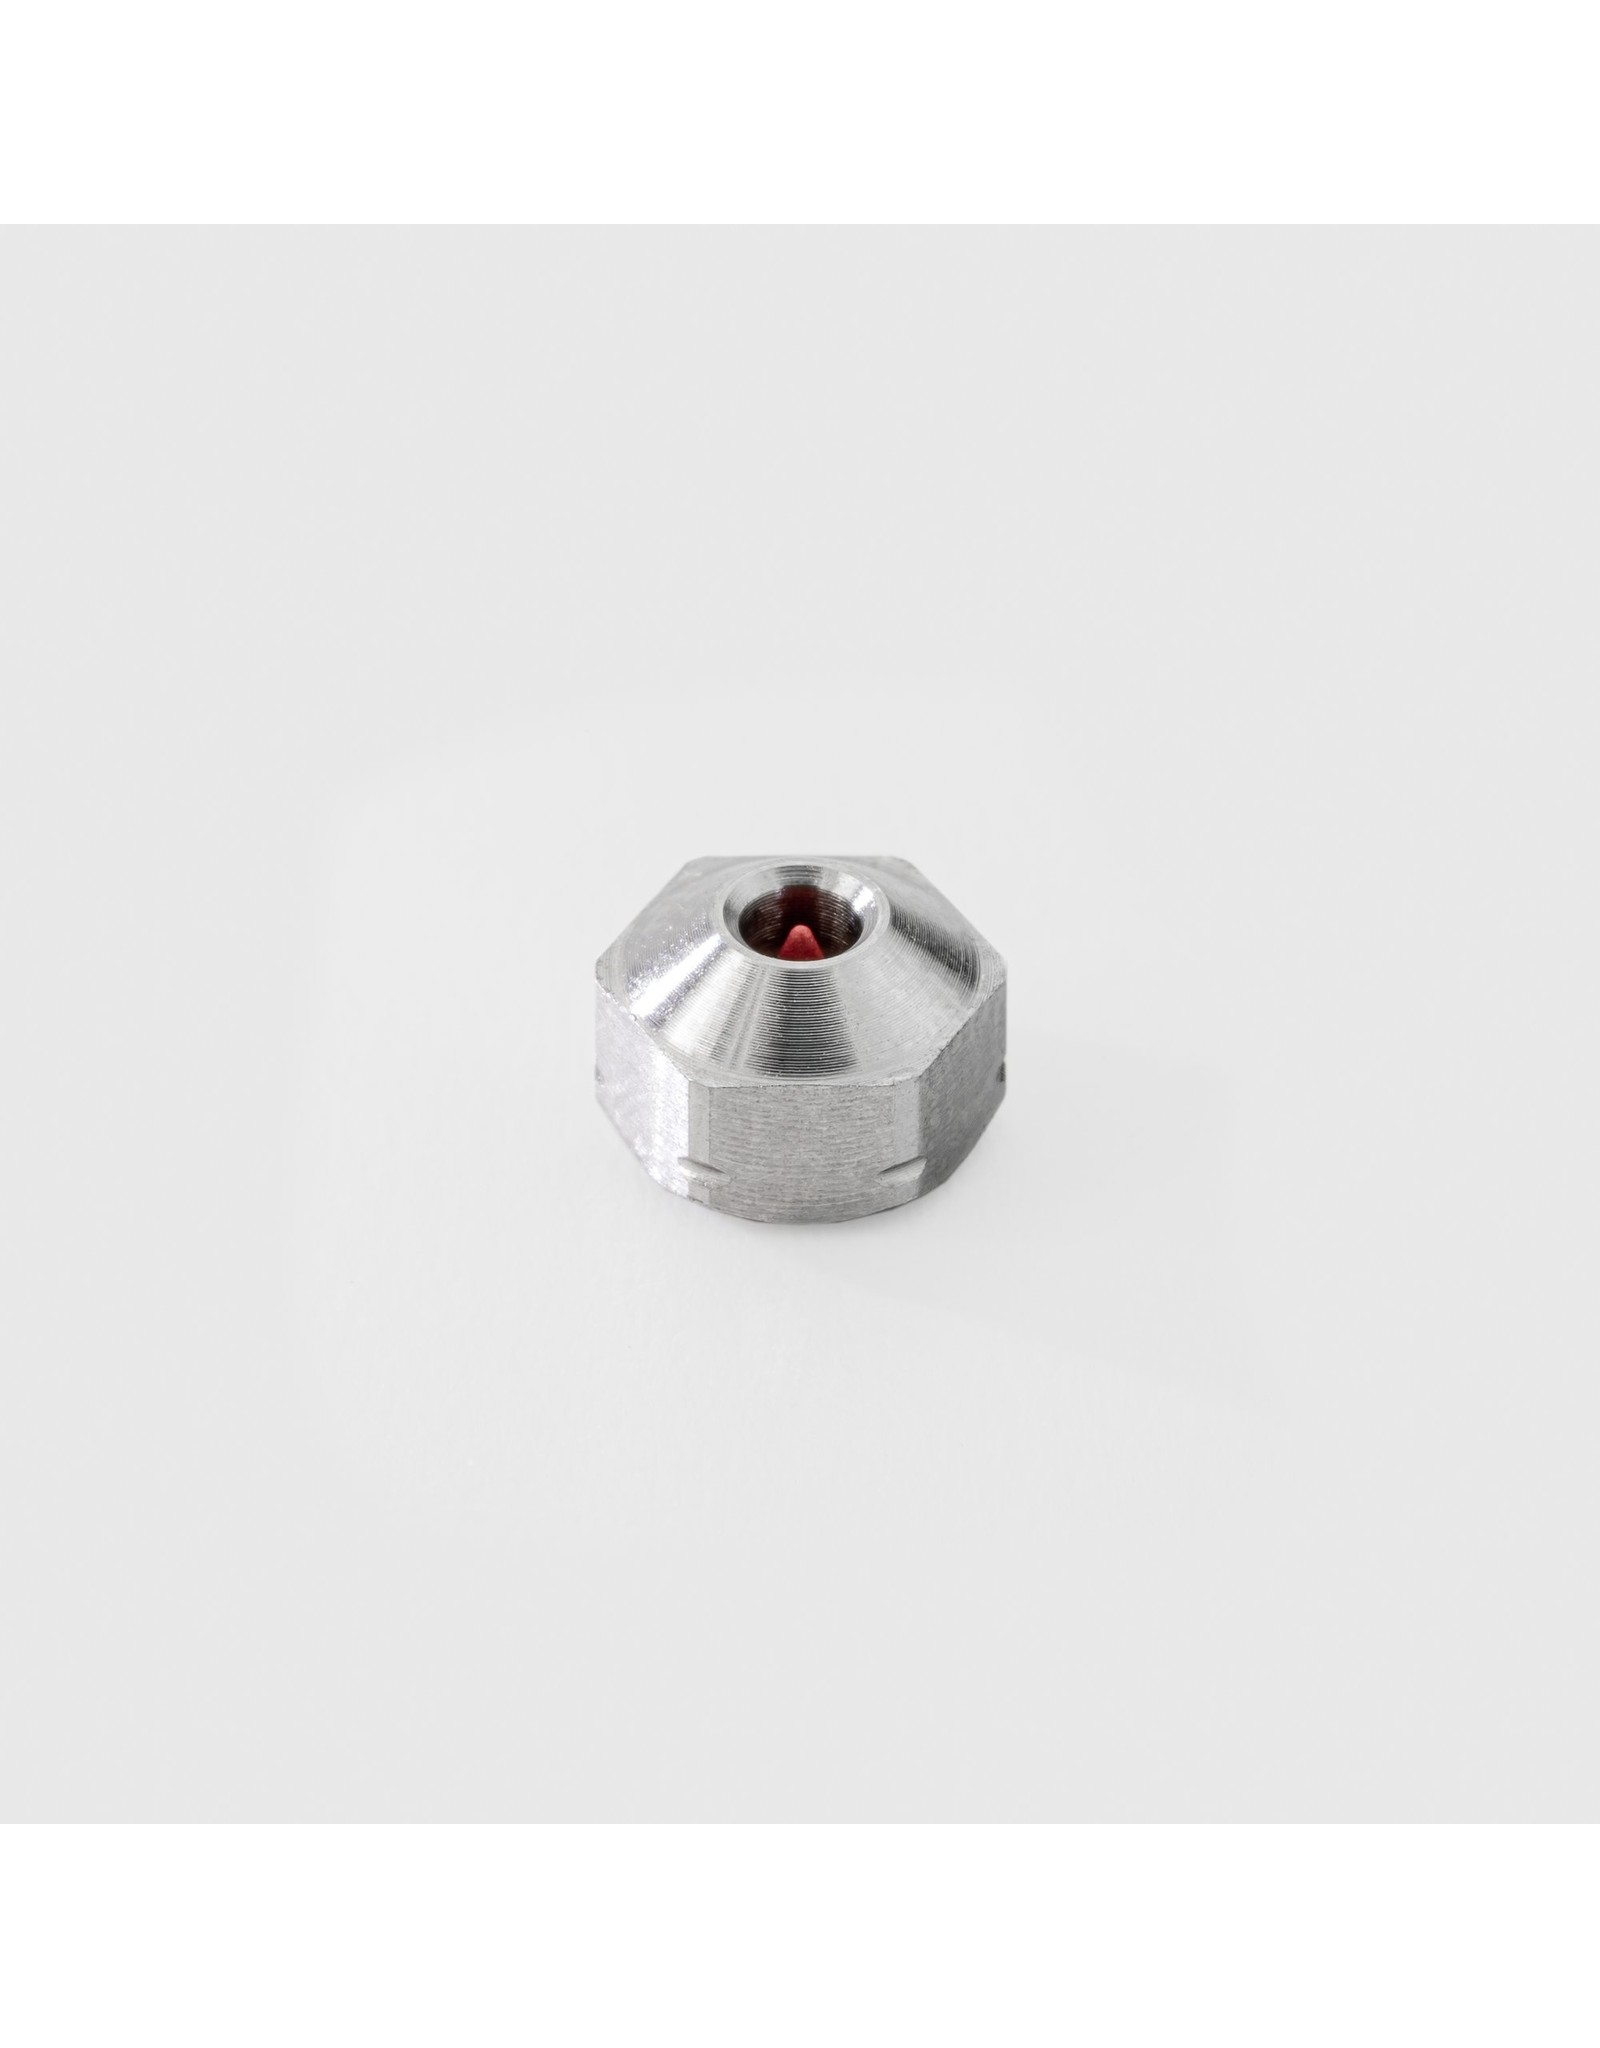 Hexlox 6mm Bolt Single